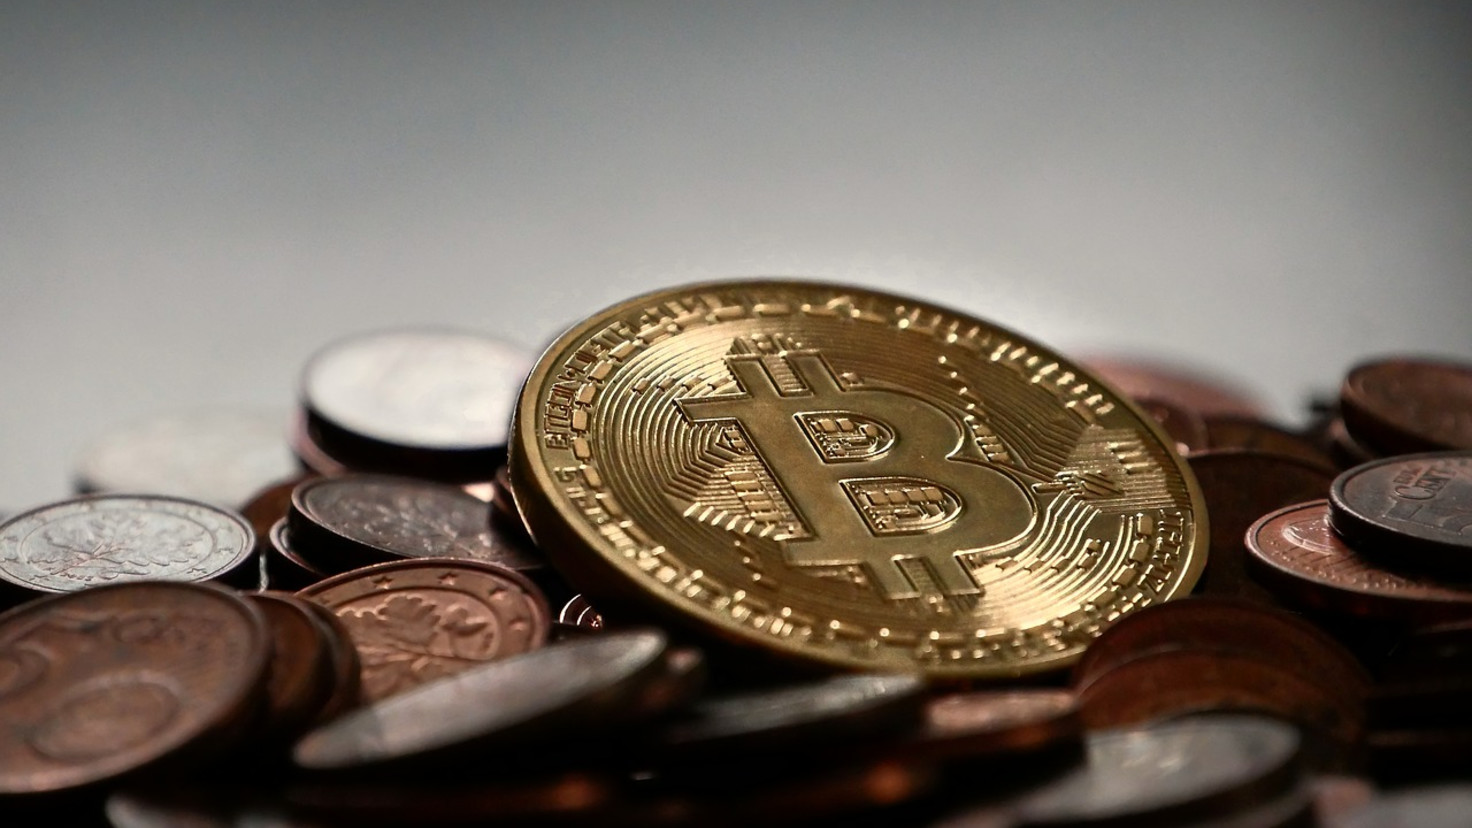 Fire engulfs Bitcoin mining farm burns destroying $10m of crypto mining equipment